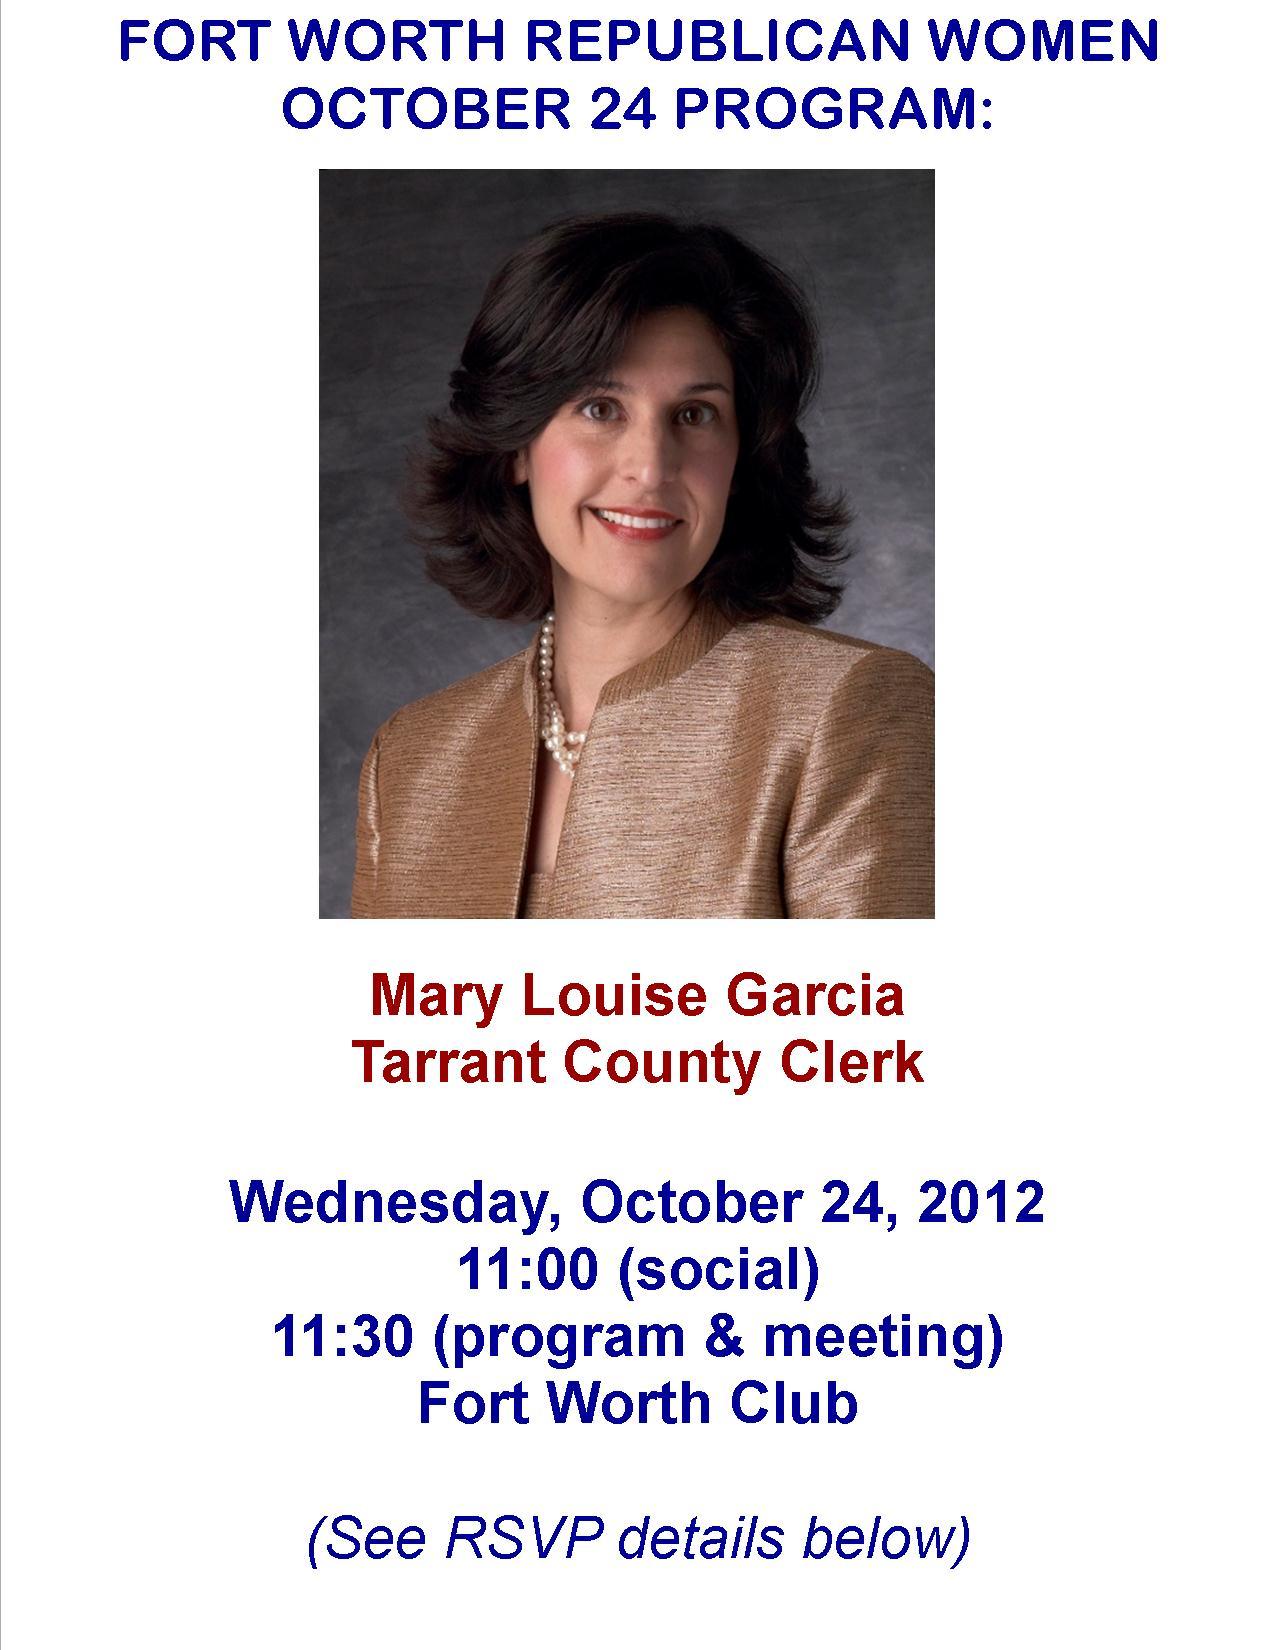 Mary Louise Garcia   FORT WORTH REPUBLICAN WOMEN